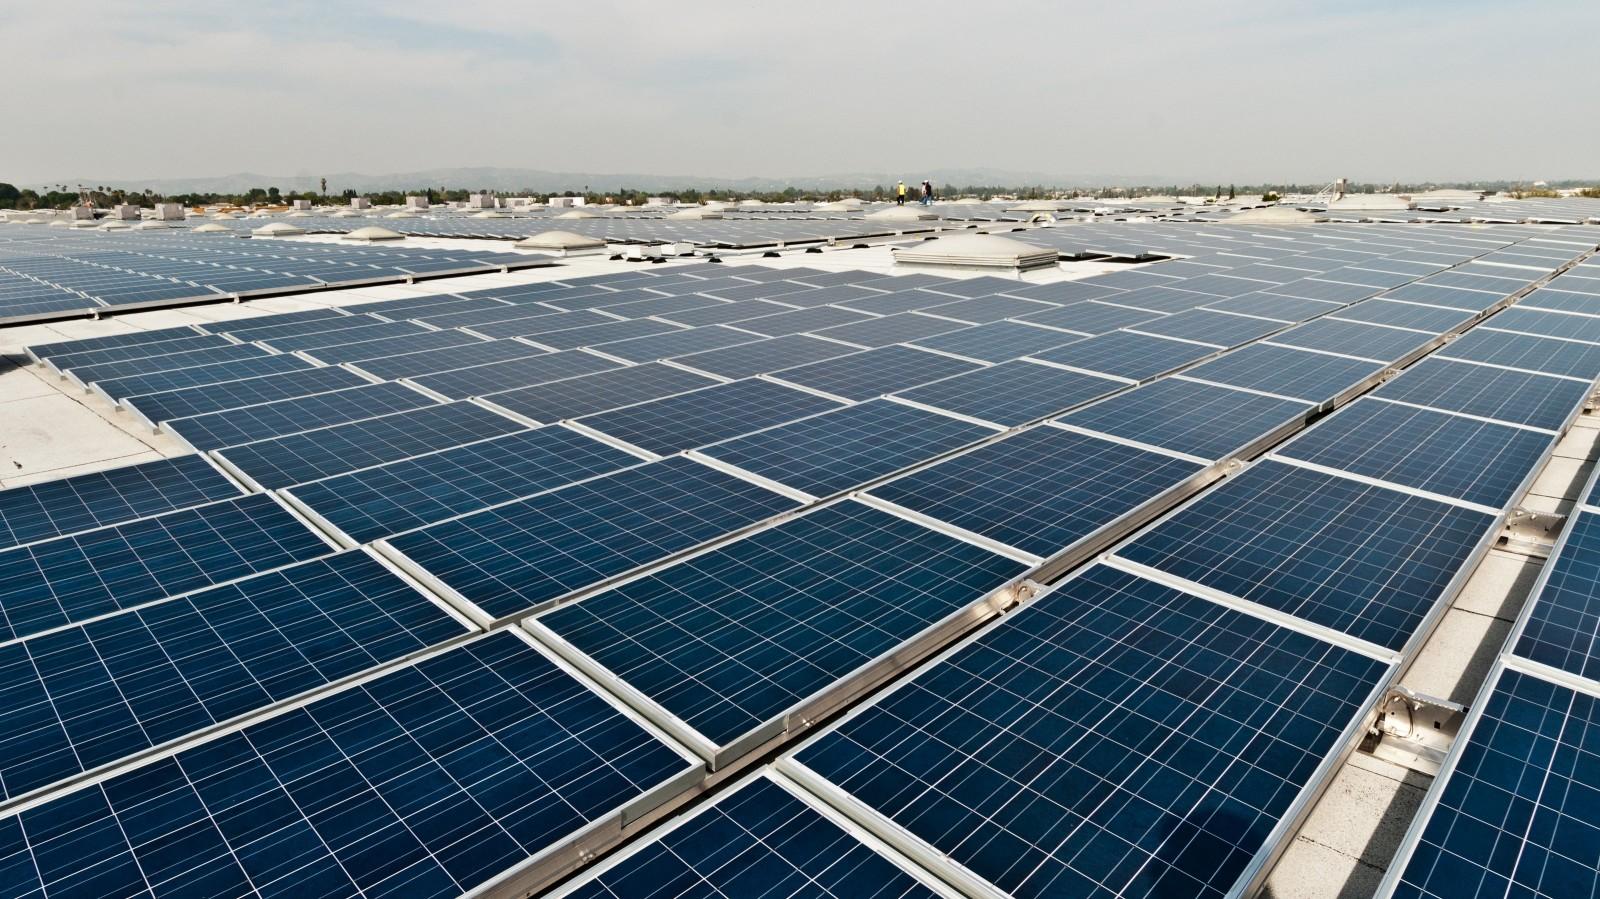 Yingli Green to Supply Borrego Solar With 40 Megawatts of Panels